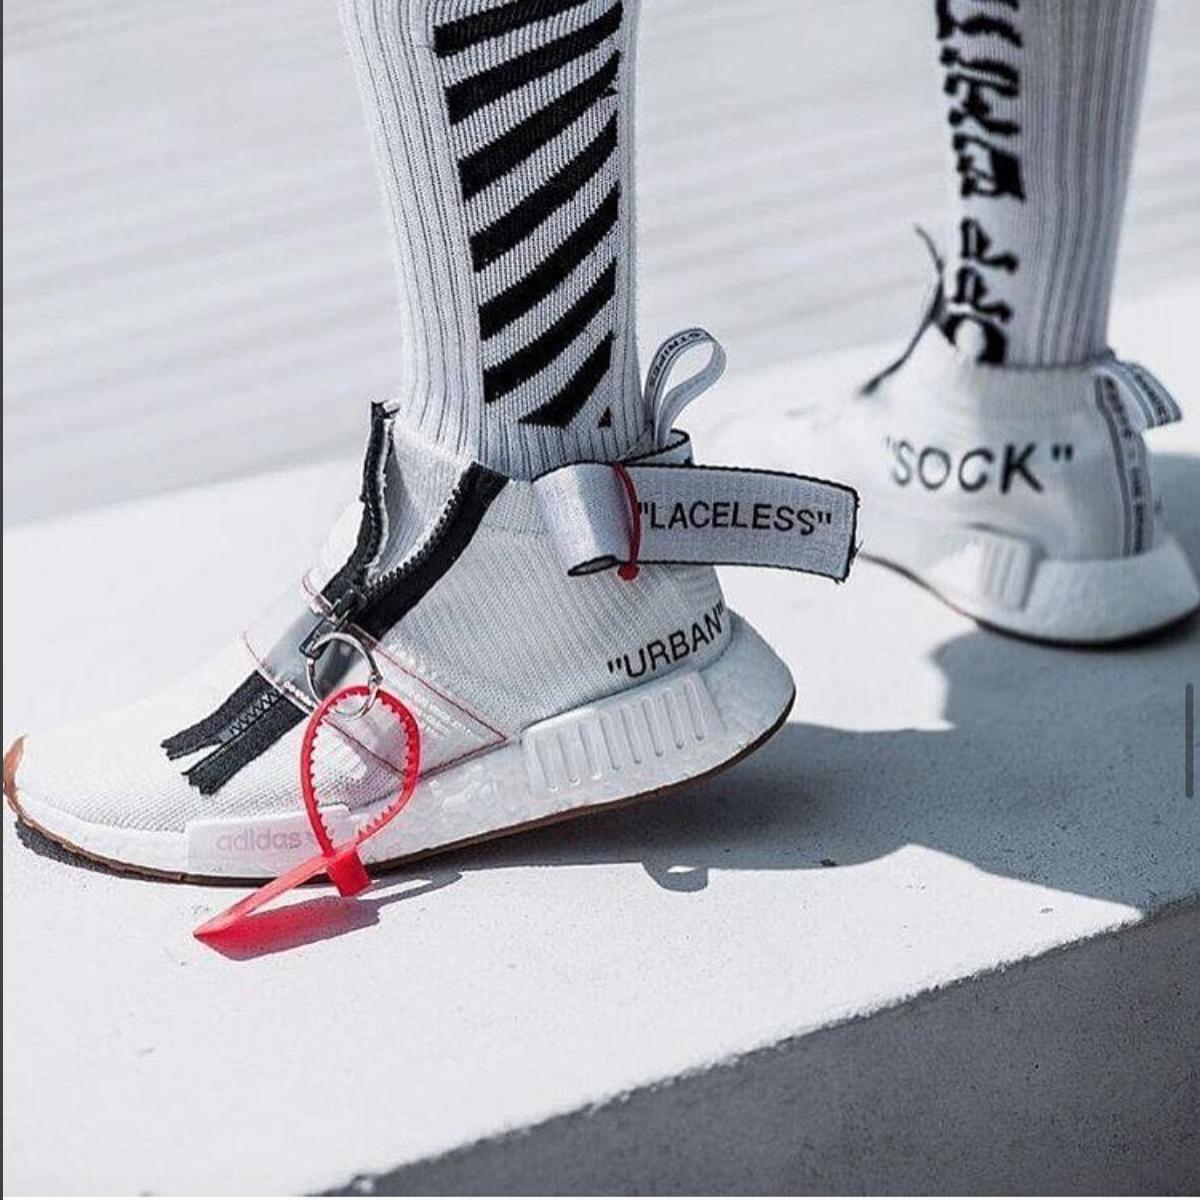 huge discount f07fb 957f0 Adidas Custom Laceless  sneakers  sneakernews  StreetStyle  Kicks  adidas   nike  vans  newbalance  puma  ADIDAS  ASICS  CONVERSE  DIADORA  REEBOK   SAUCONY